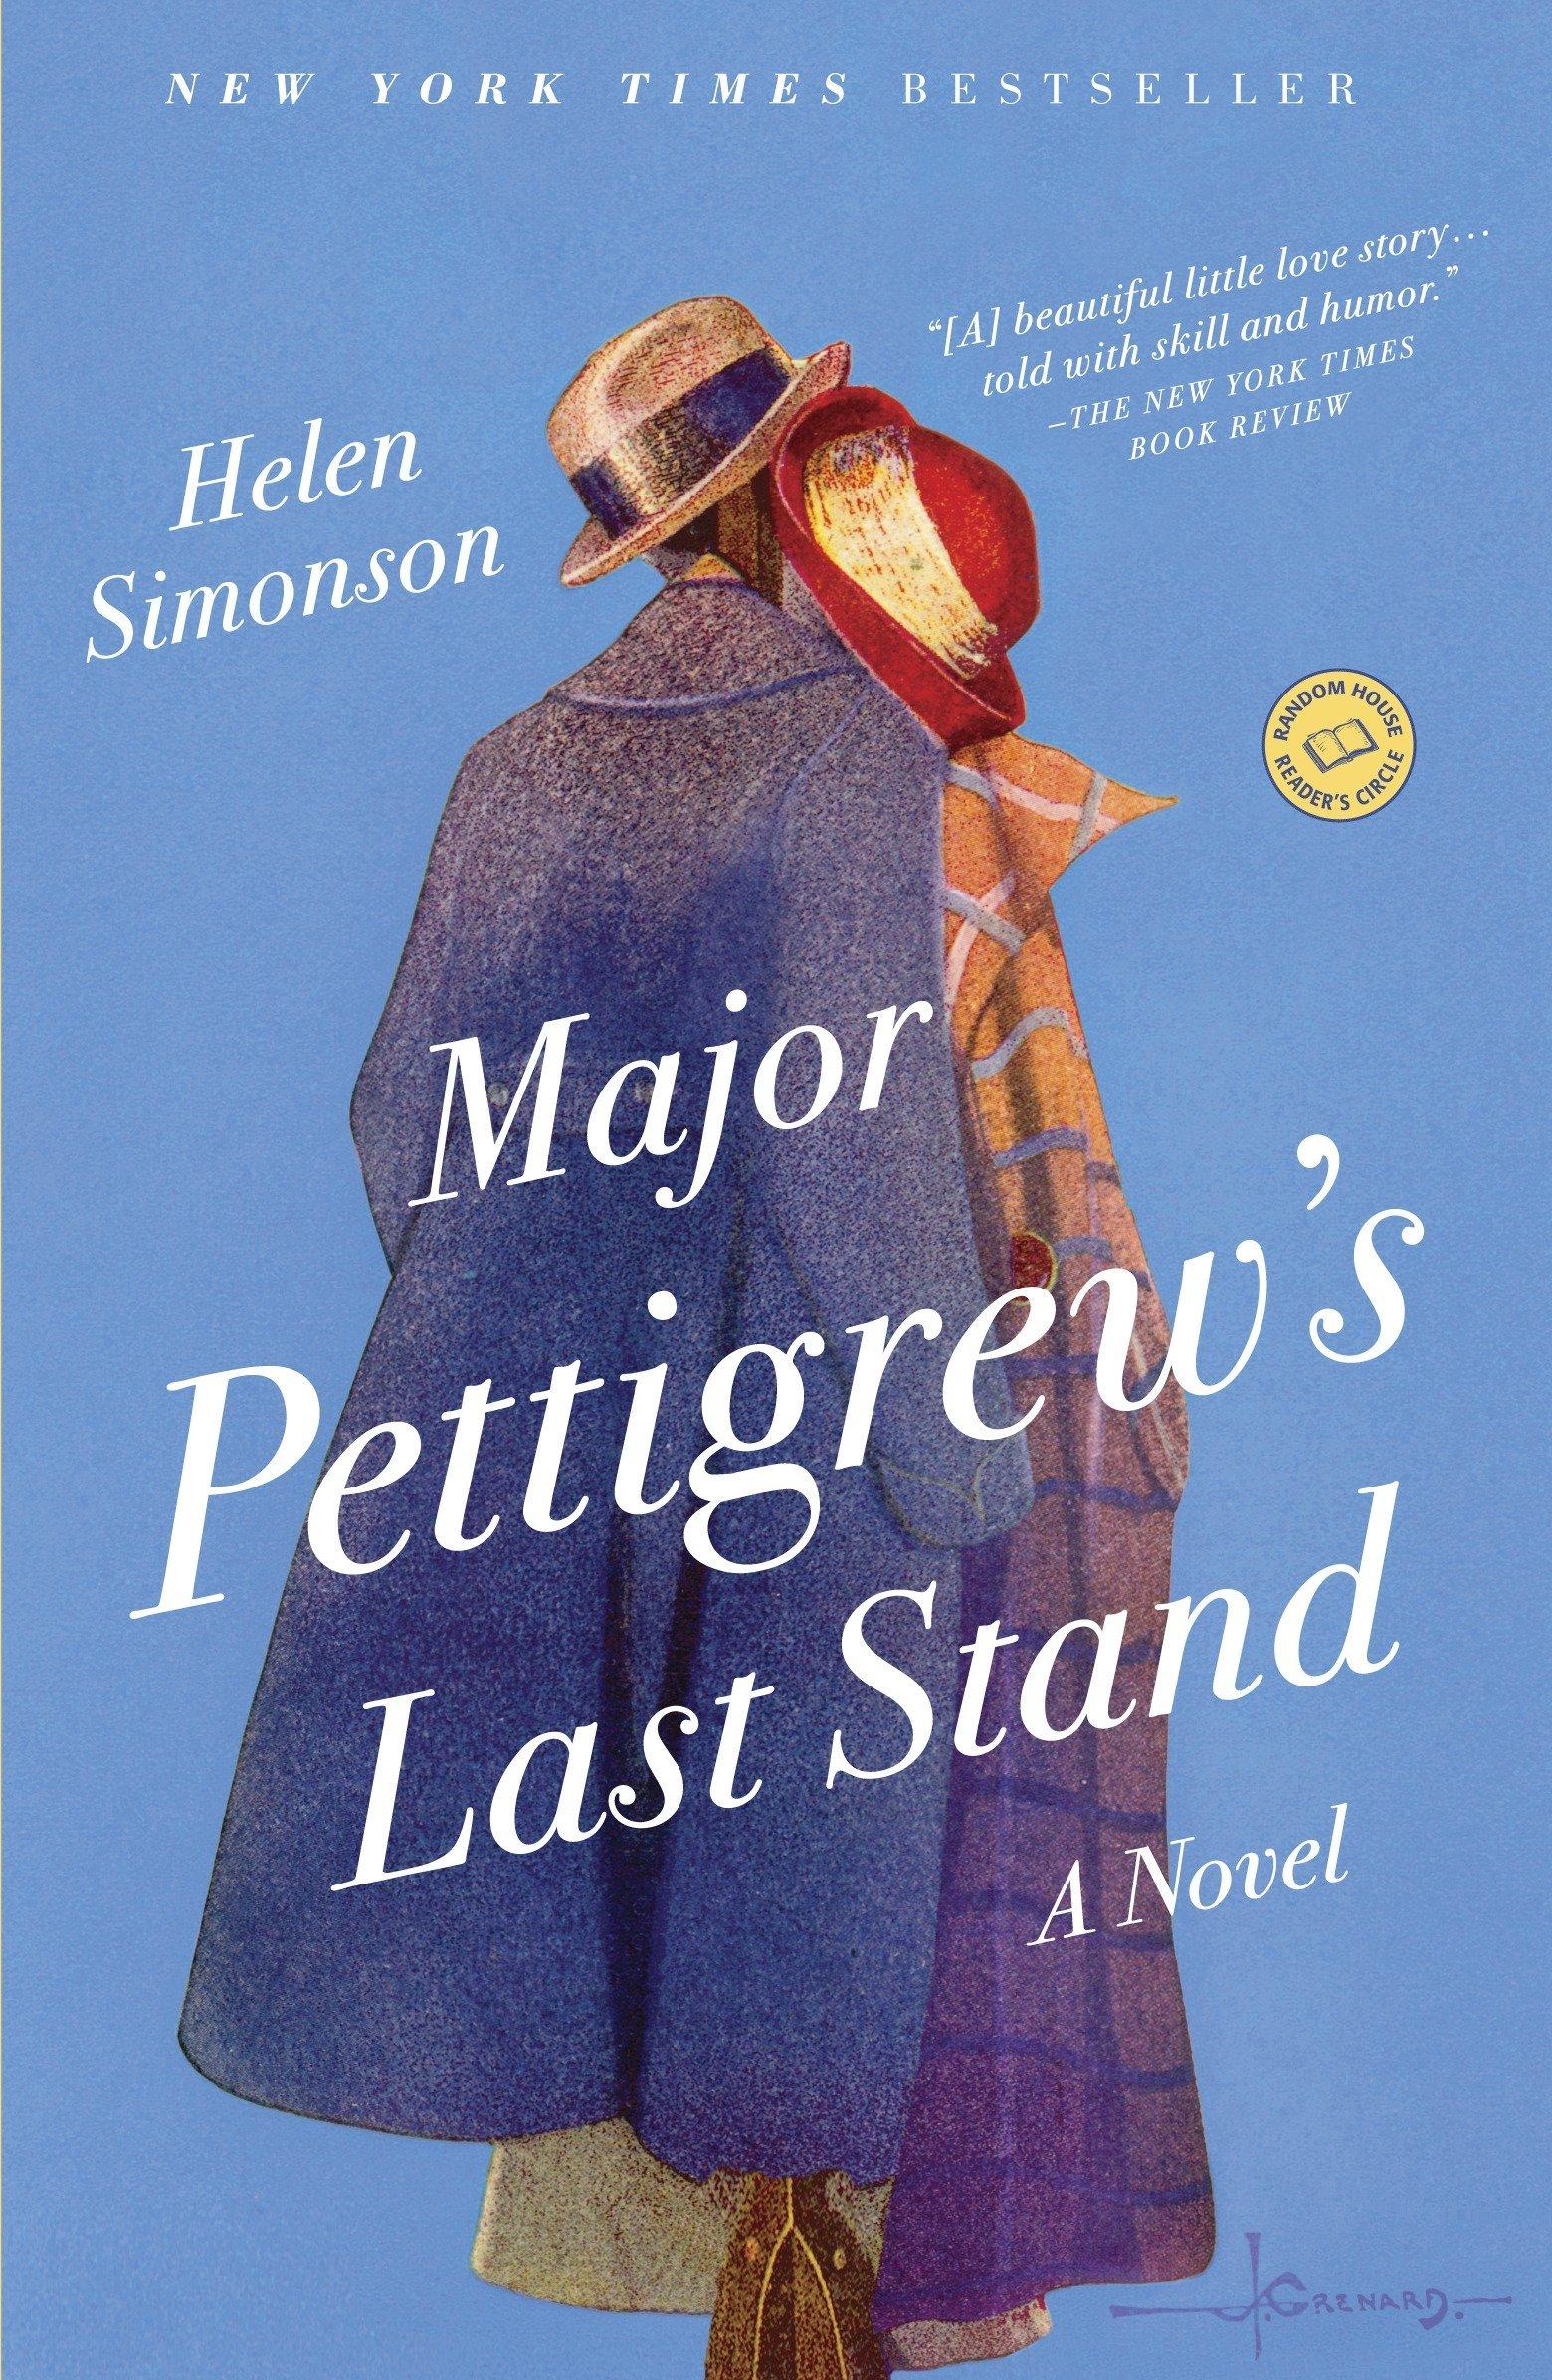 Amazon.com: Major Pettigrew's Last Stand: A Novel (9780812981223 ...